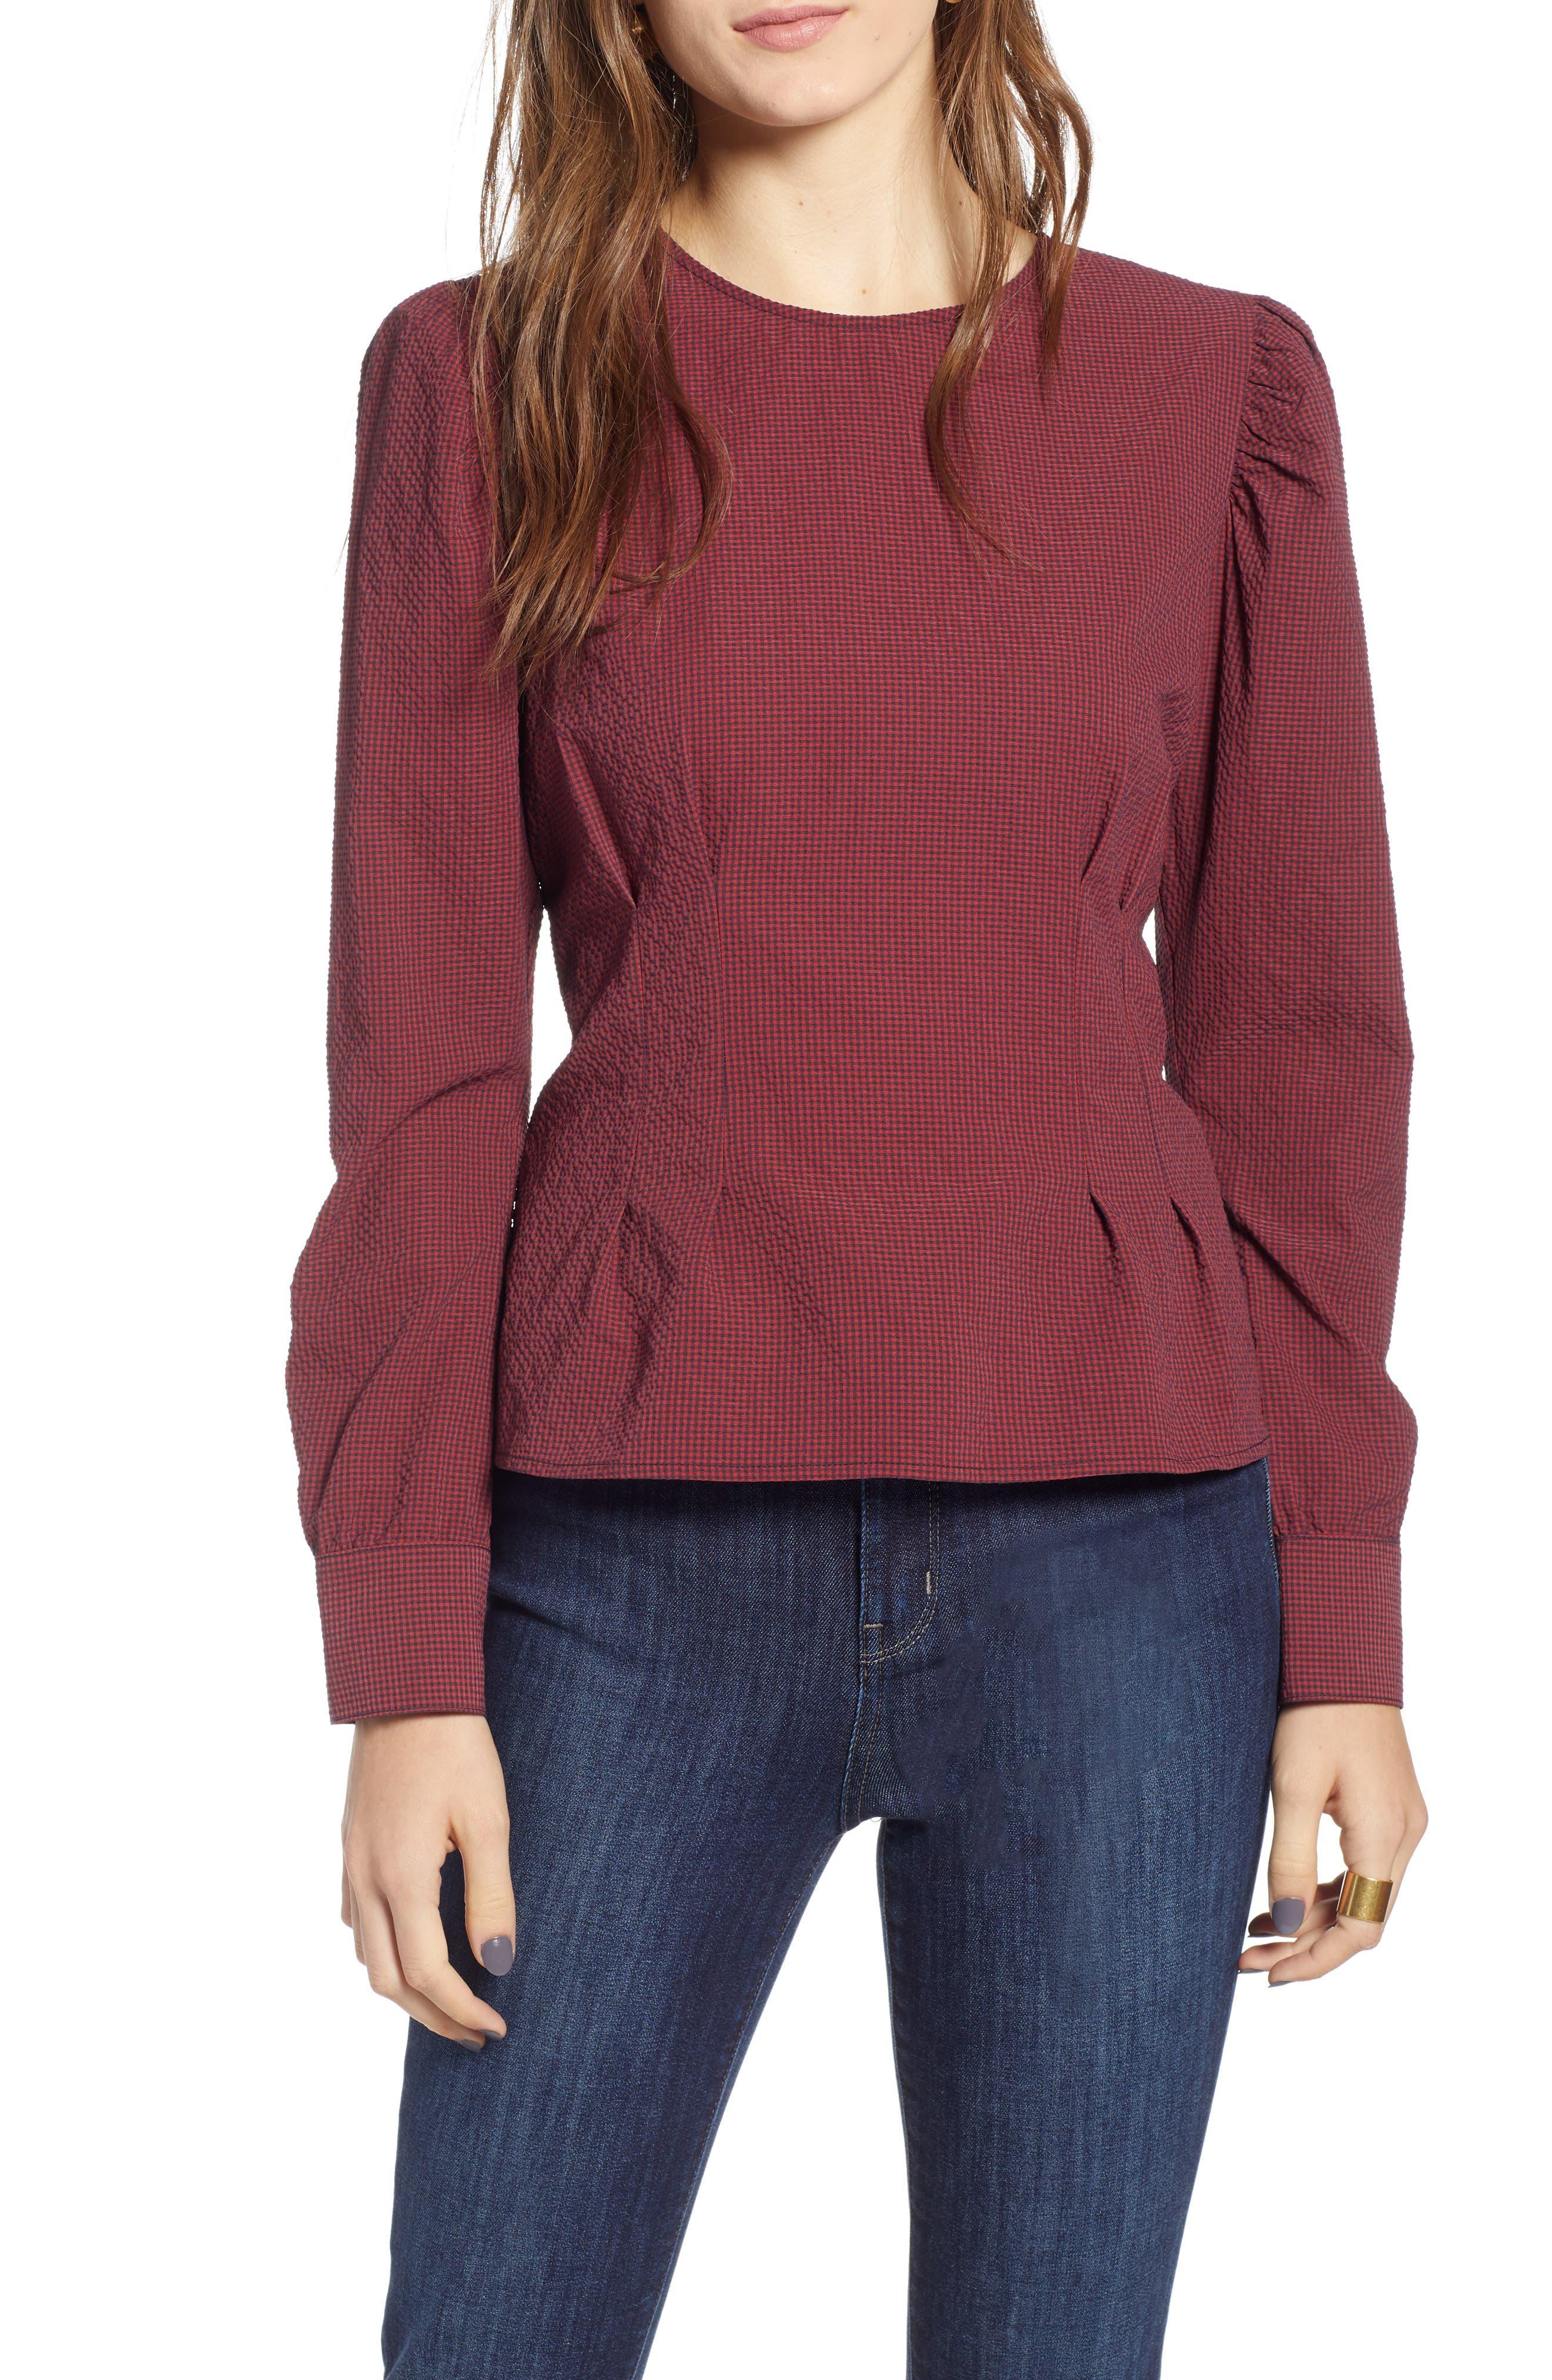 TREASURE & BOND Mini Gingham Puff Sleeve Top, Main, color, 610